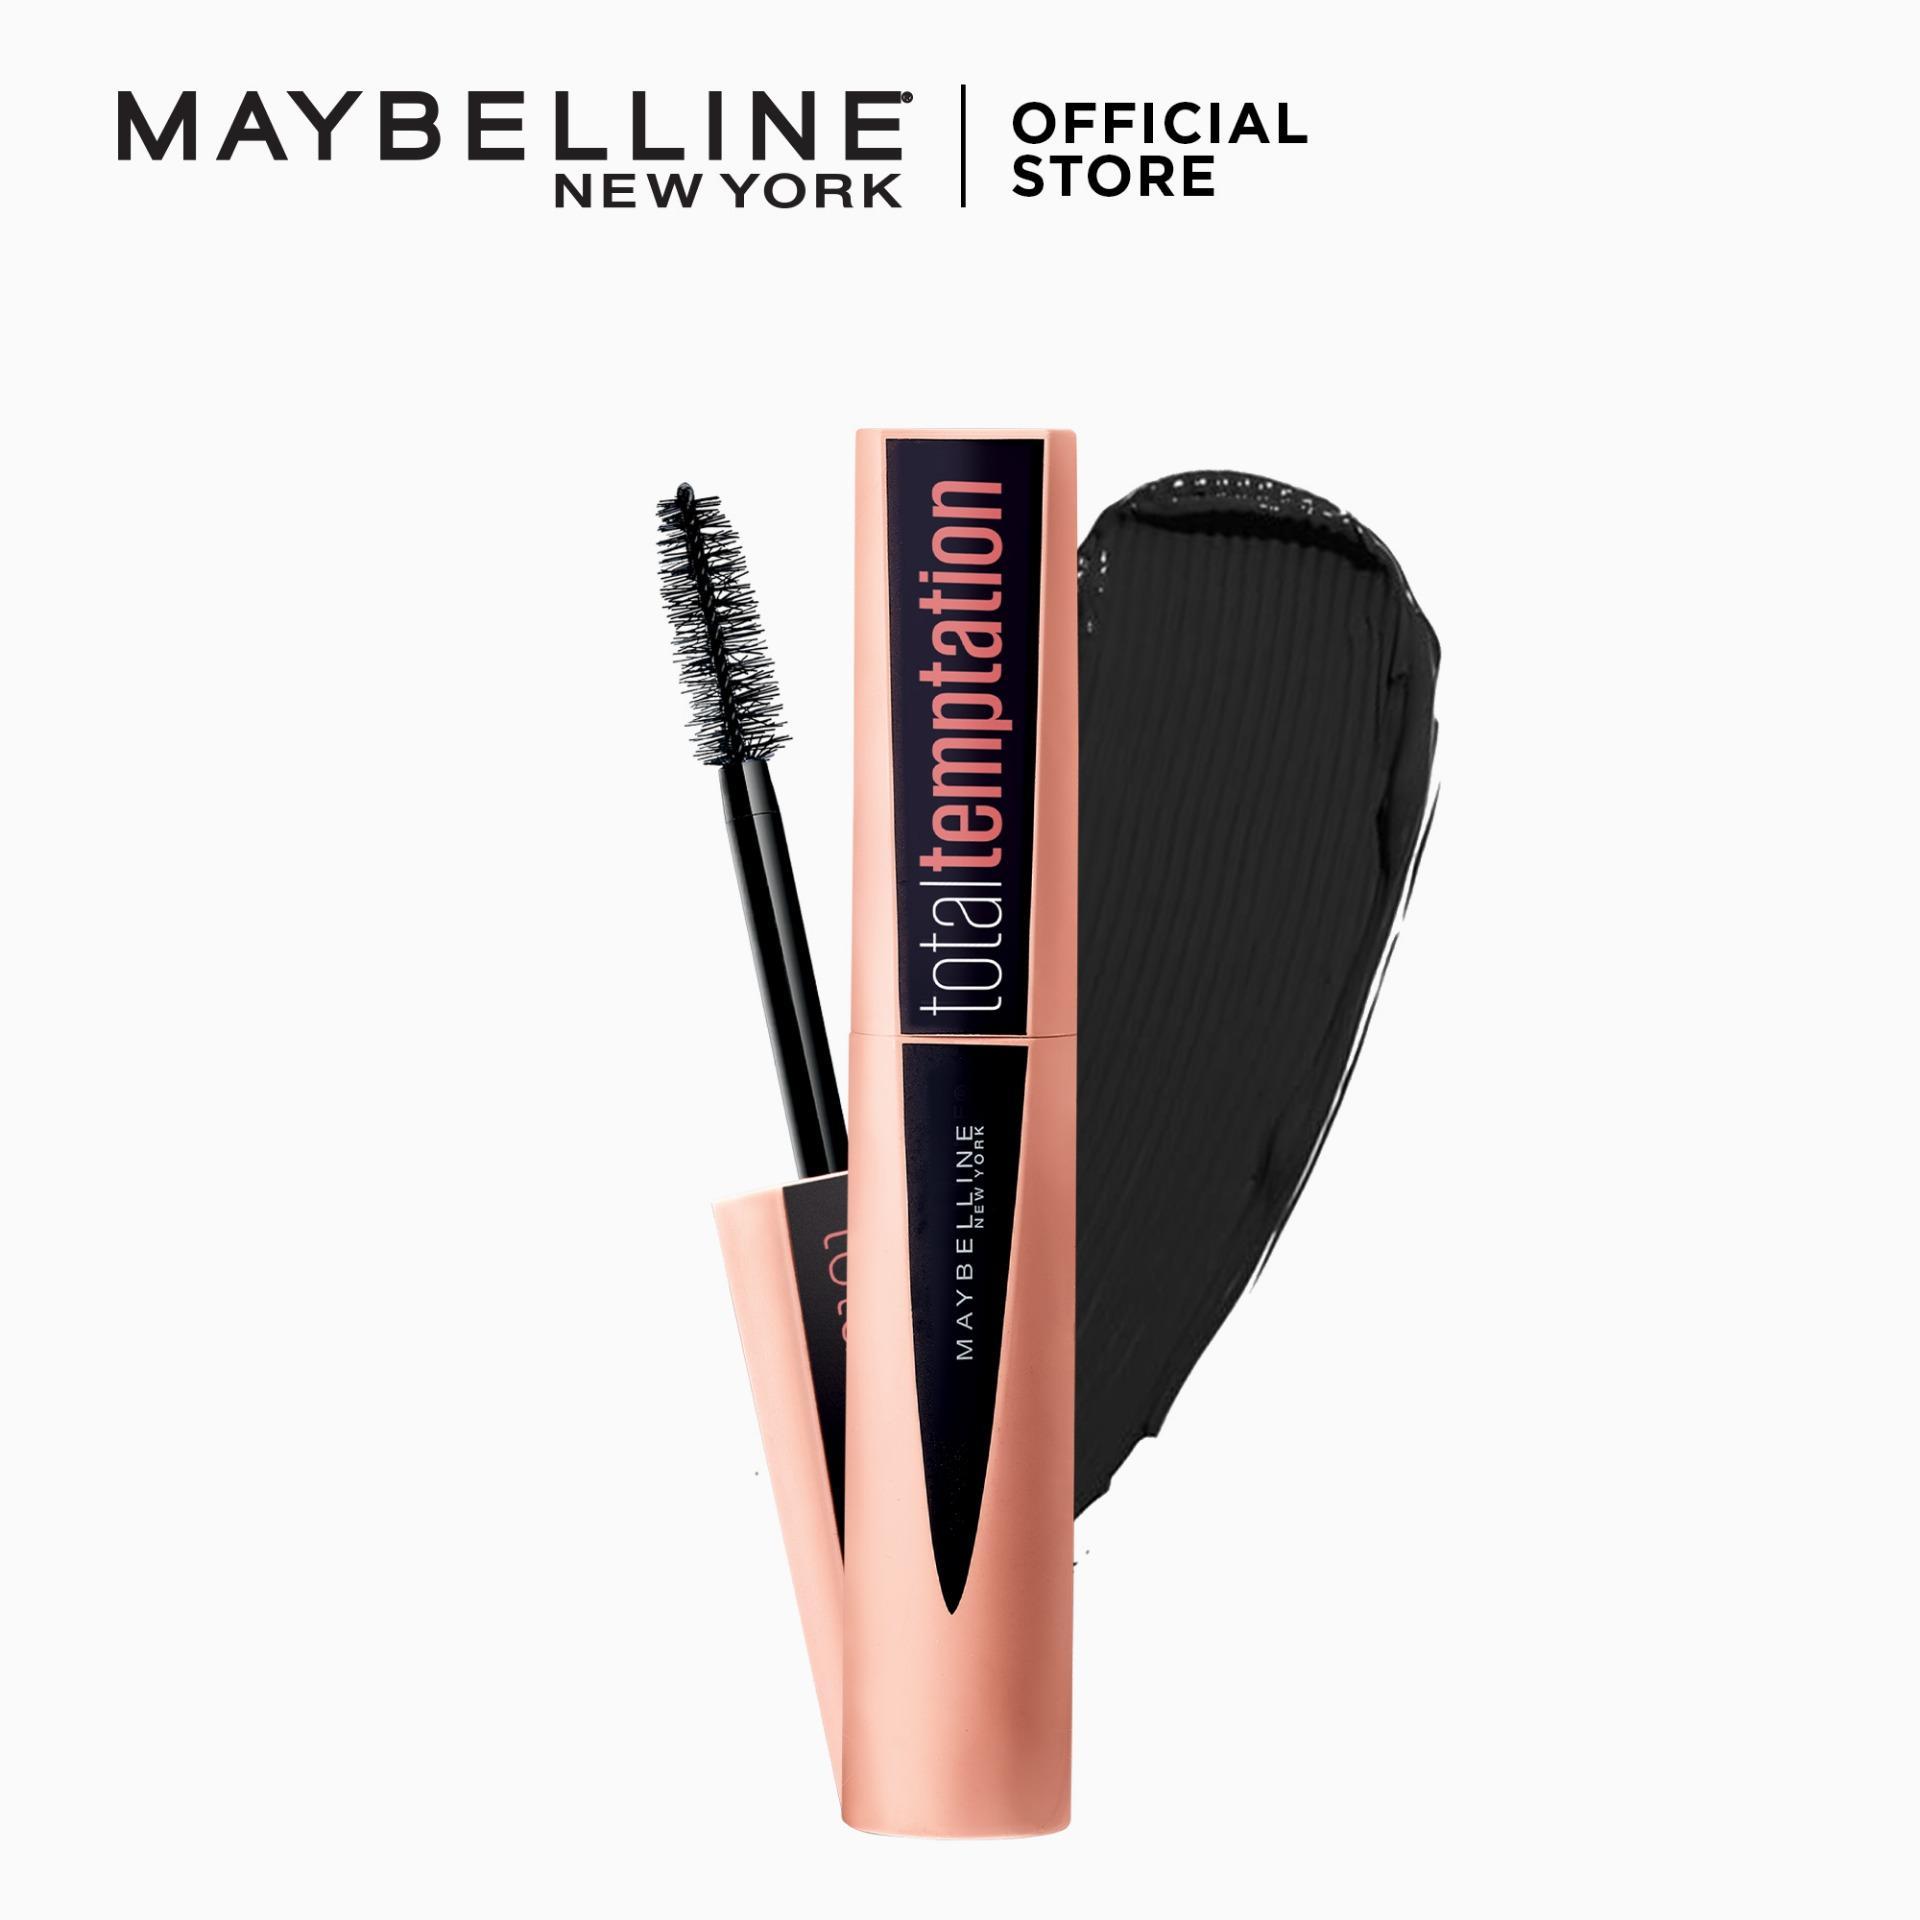 231067ba49f Maybelline Philippines: Maybelline price list - Maybelline Lipstick ...